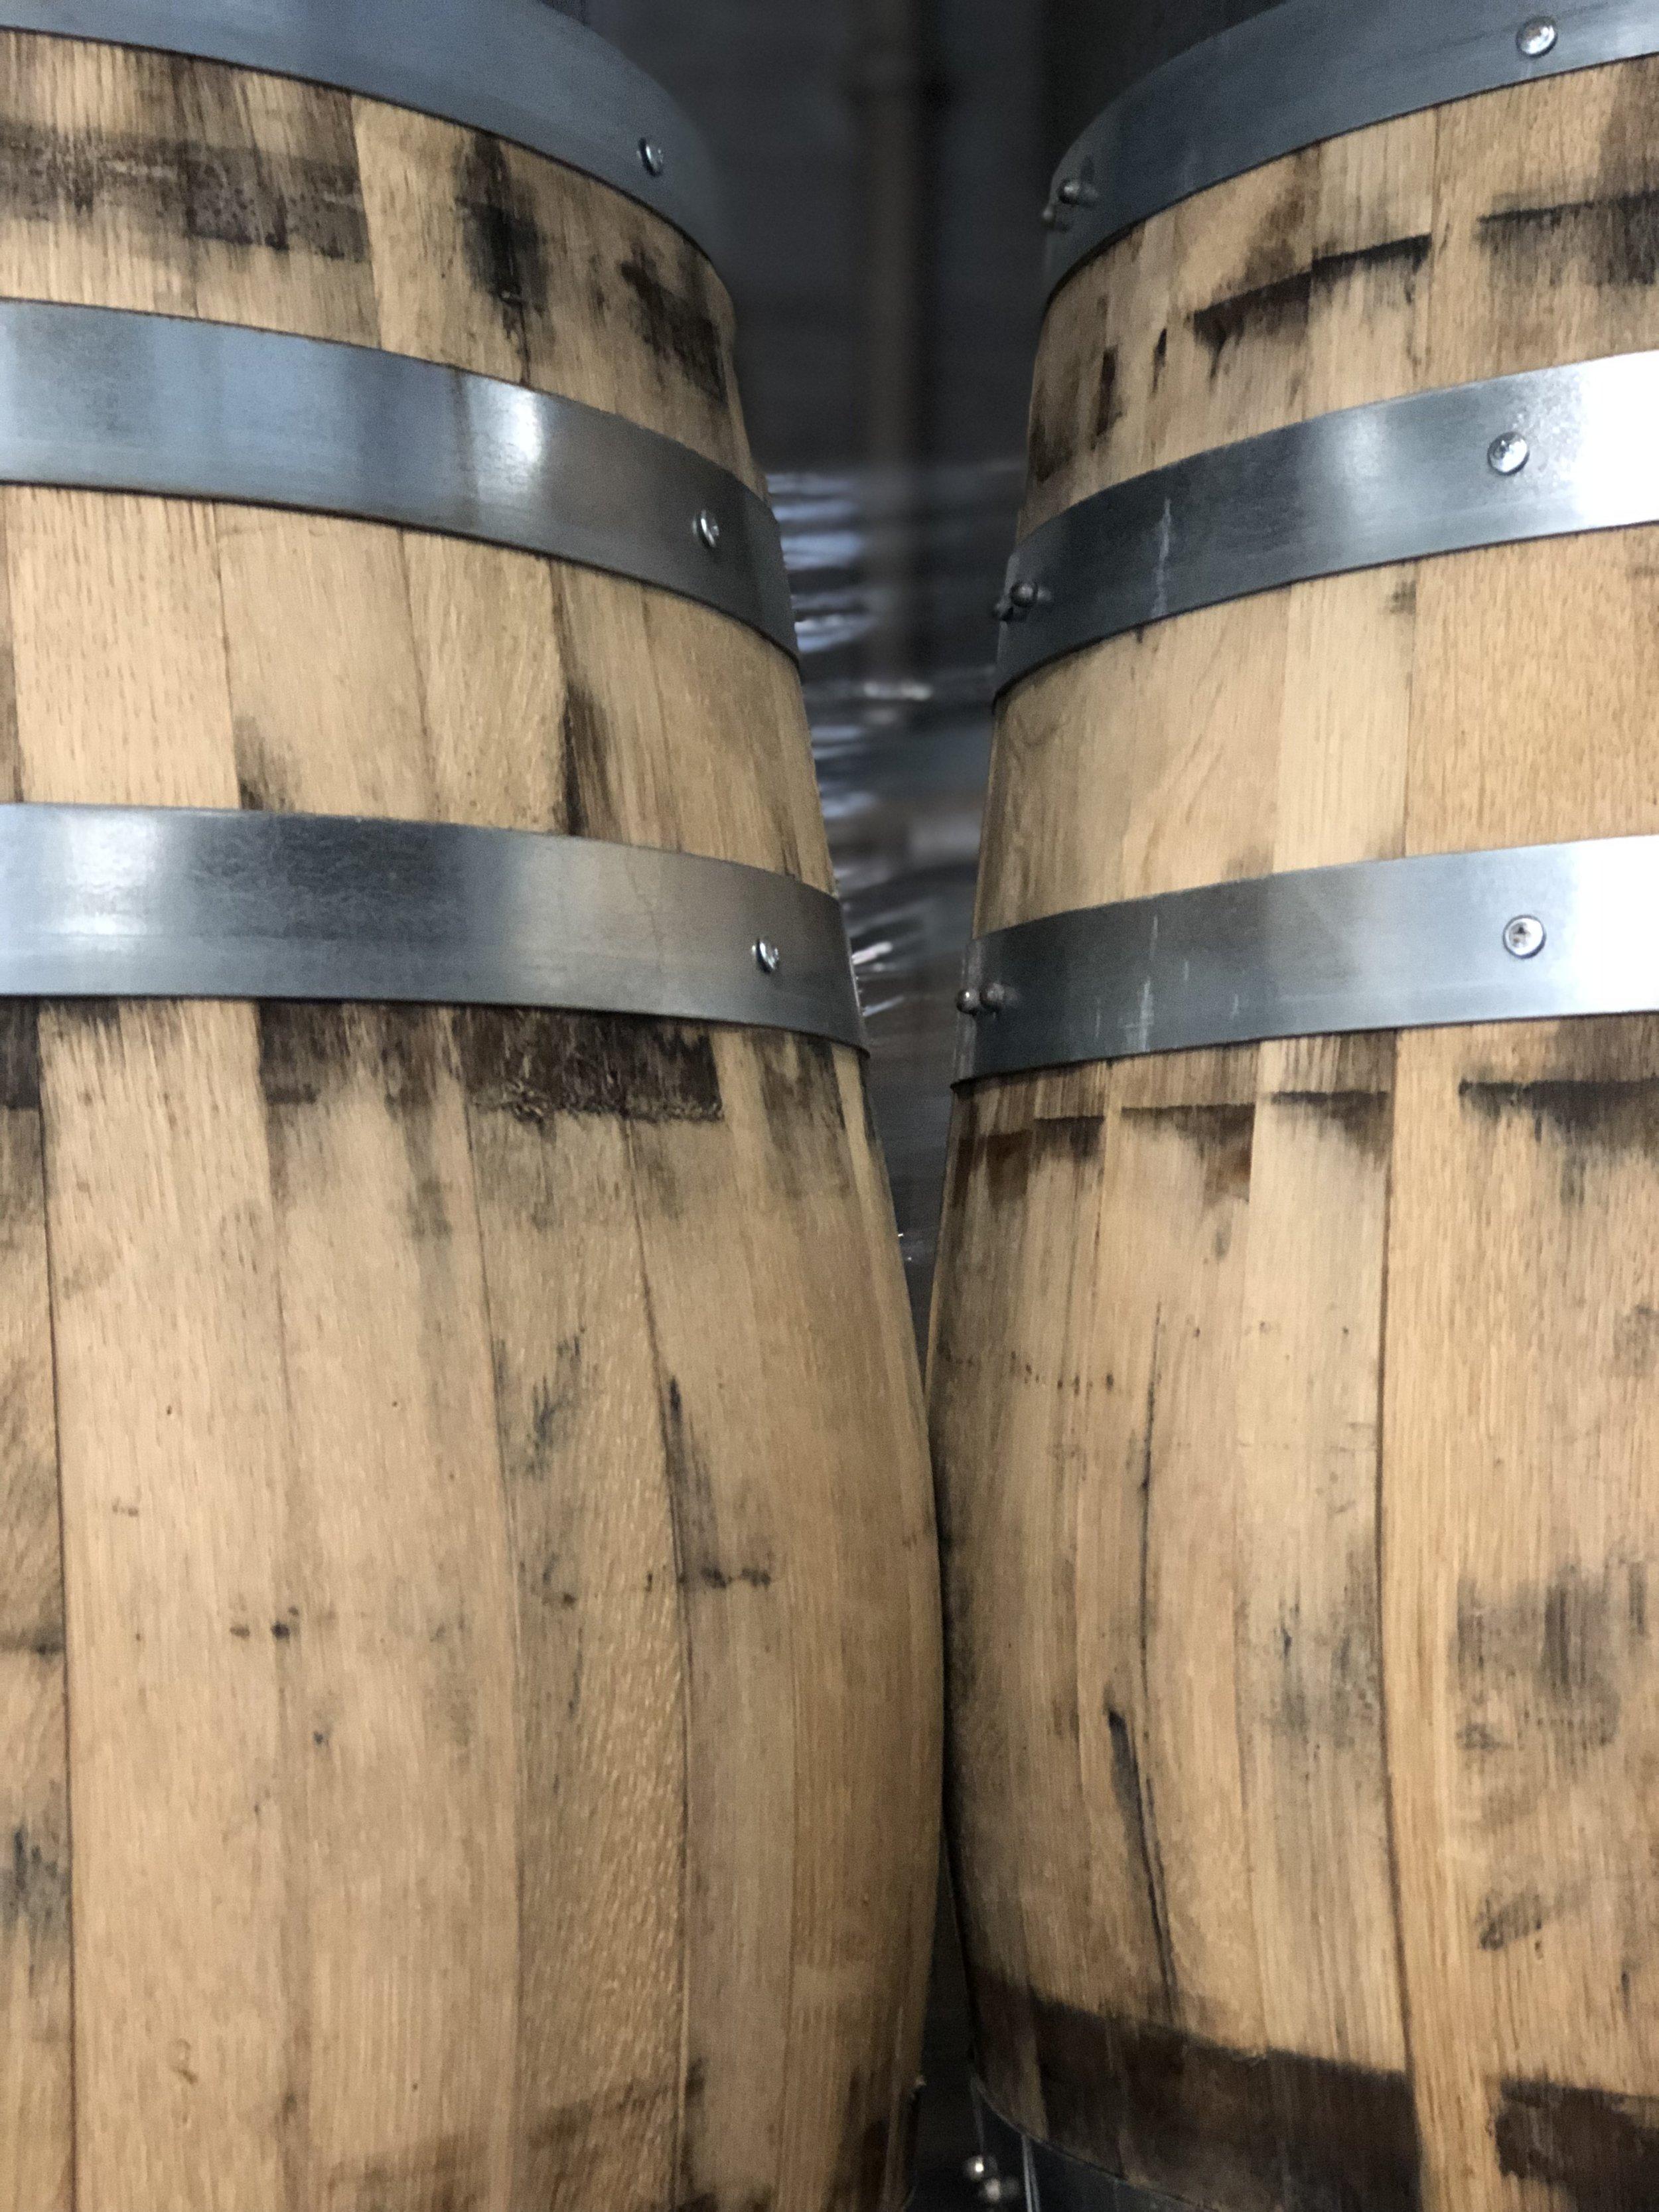 Distilleries around Birmingham will benefit from the Alabama Legislature's recent quality of life bills.